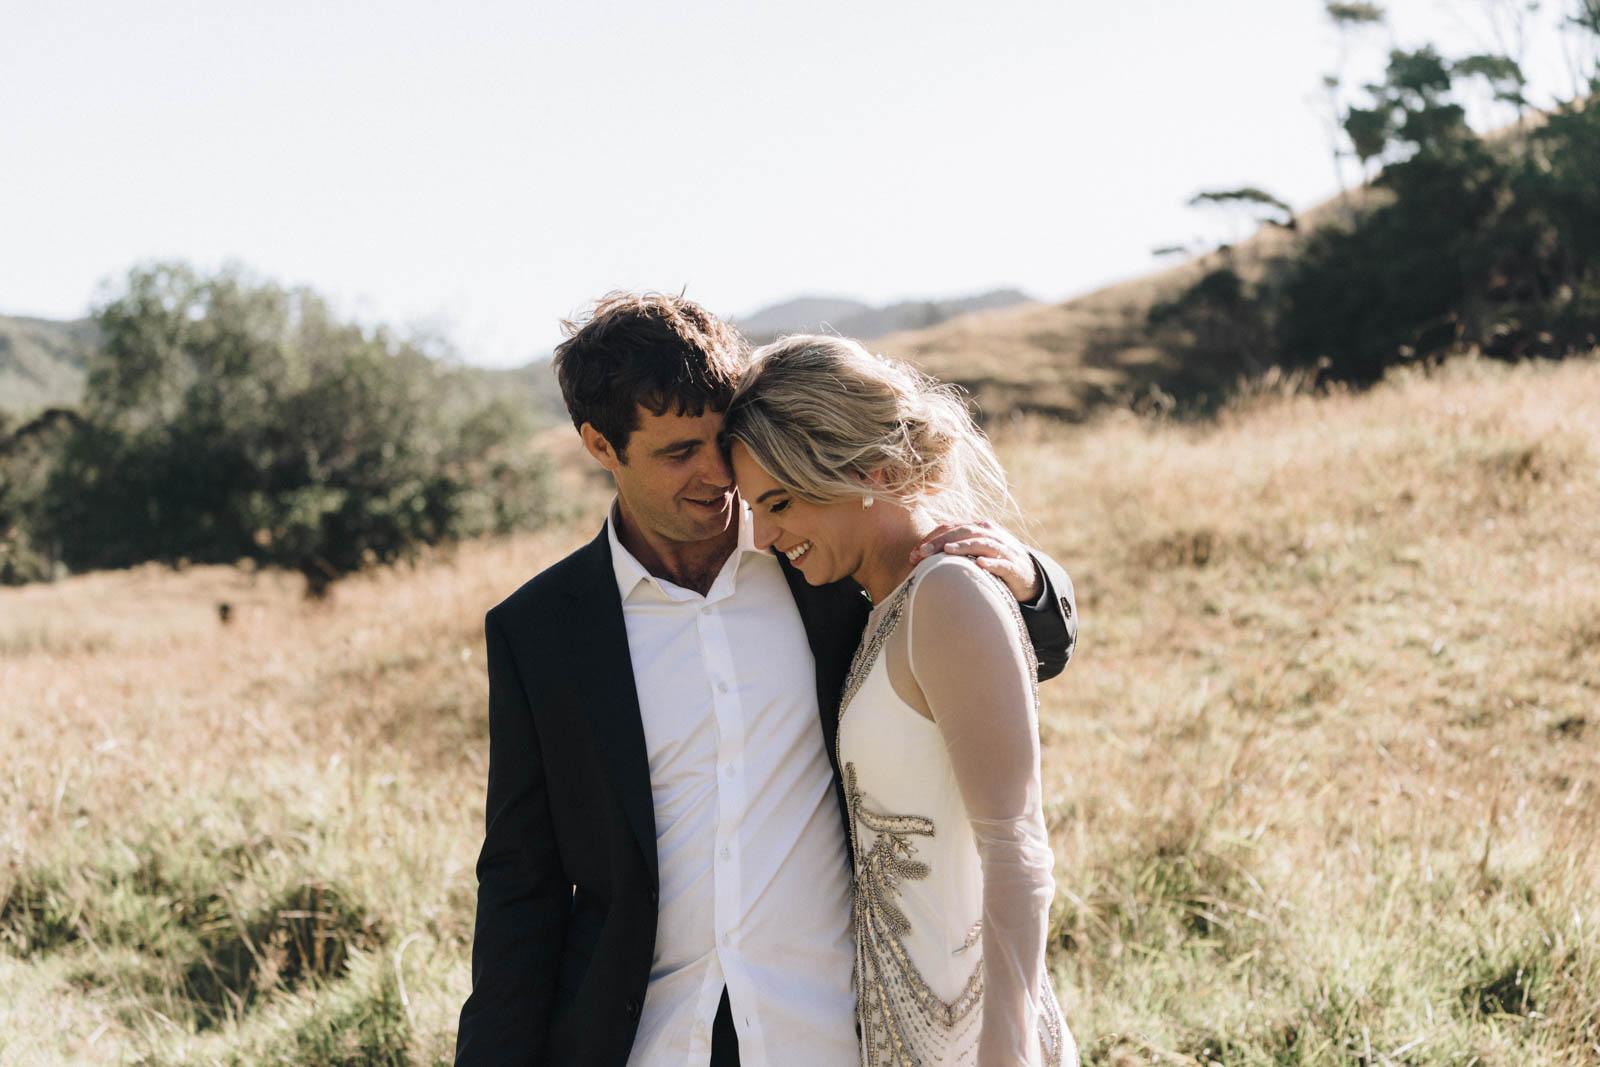 newfound-l-i-coromandel-wedding-photographer-1735-A9_03918